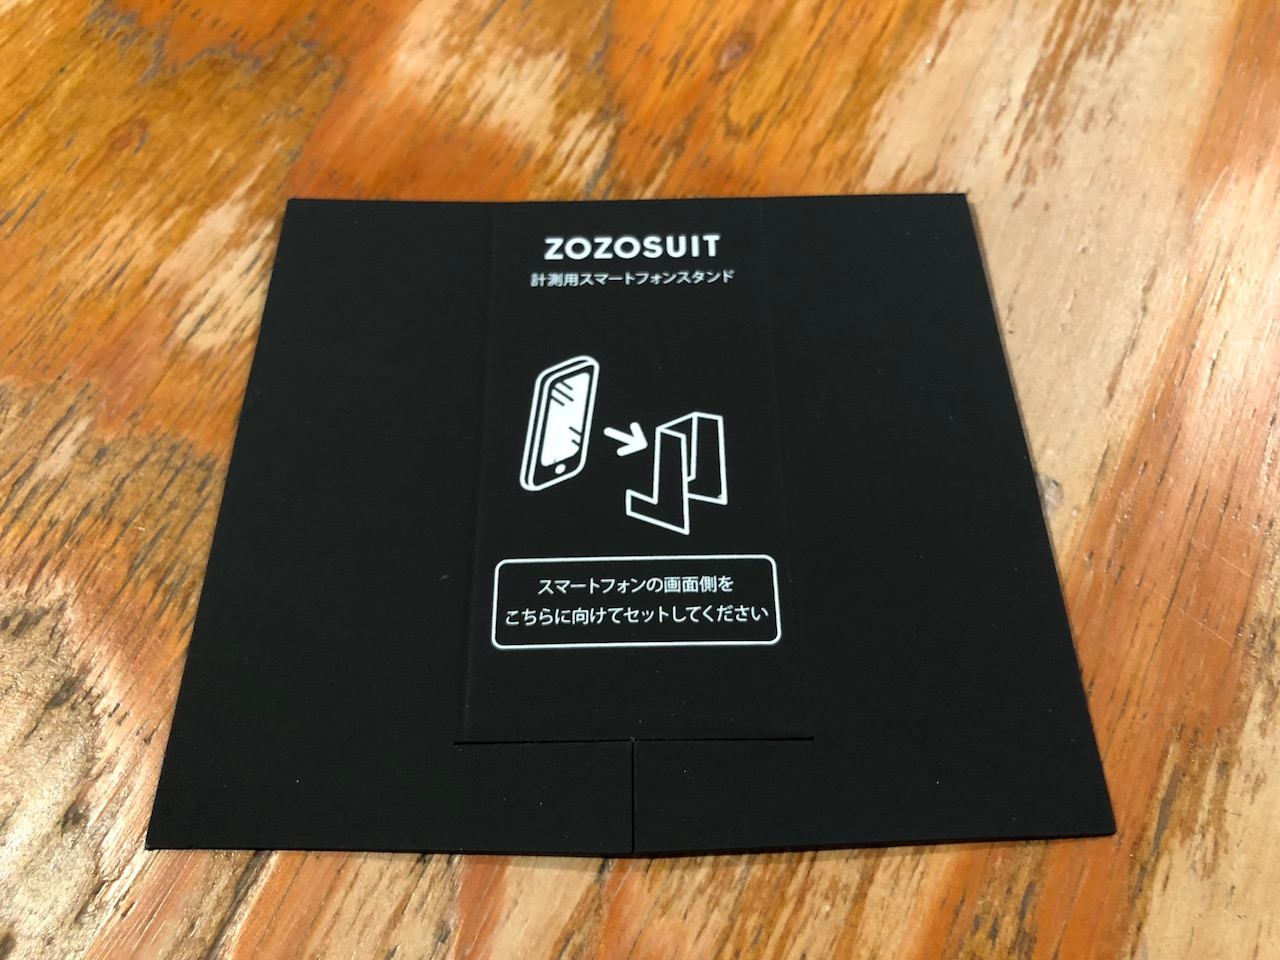 ZOZOSUIT(ゾゾスーツ)届いた?届かない?実際に着てみた人がゲキヤバw 体型計測方法は